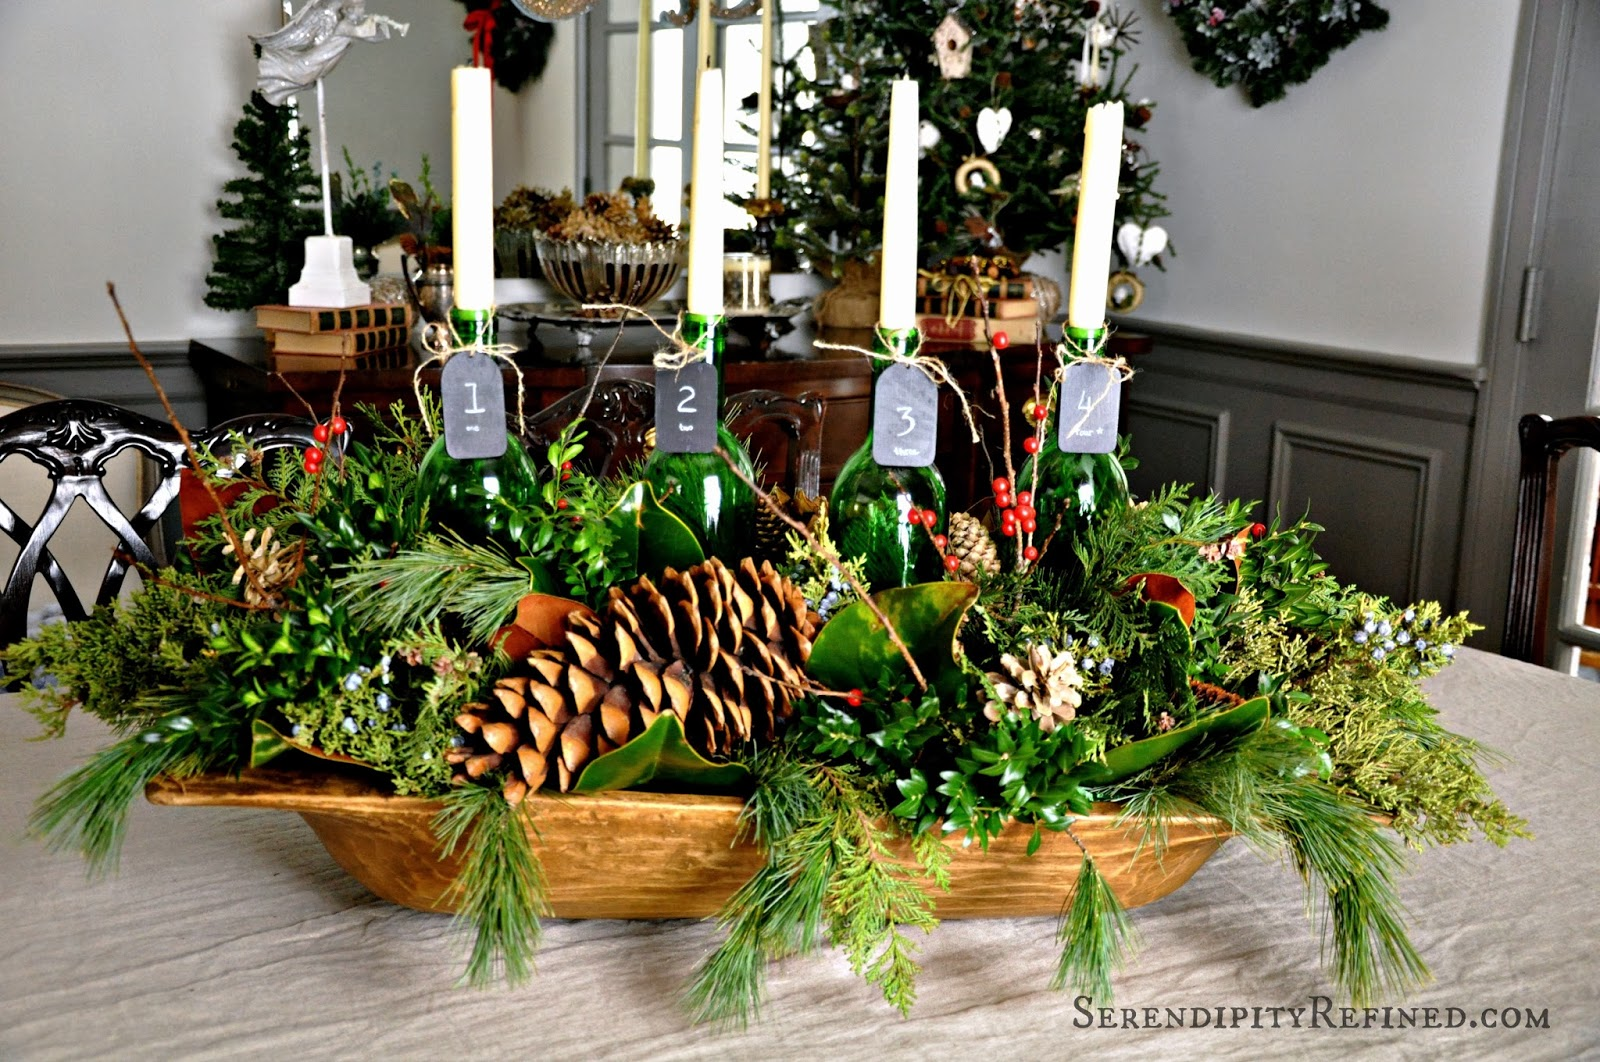 Serendipity refined blog simple rustic advent wreath - Ideen adventskranz ...